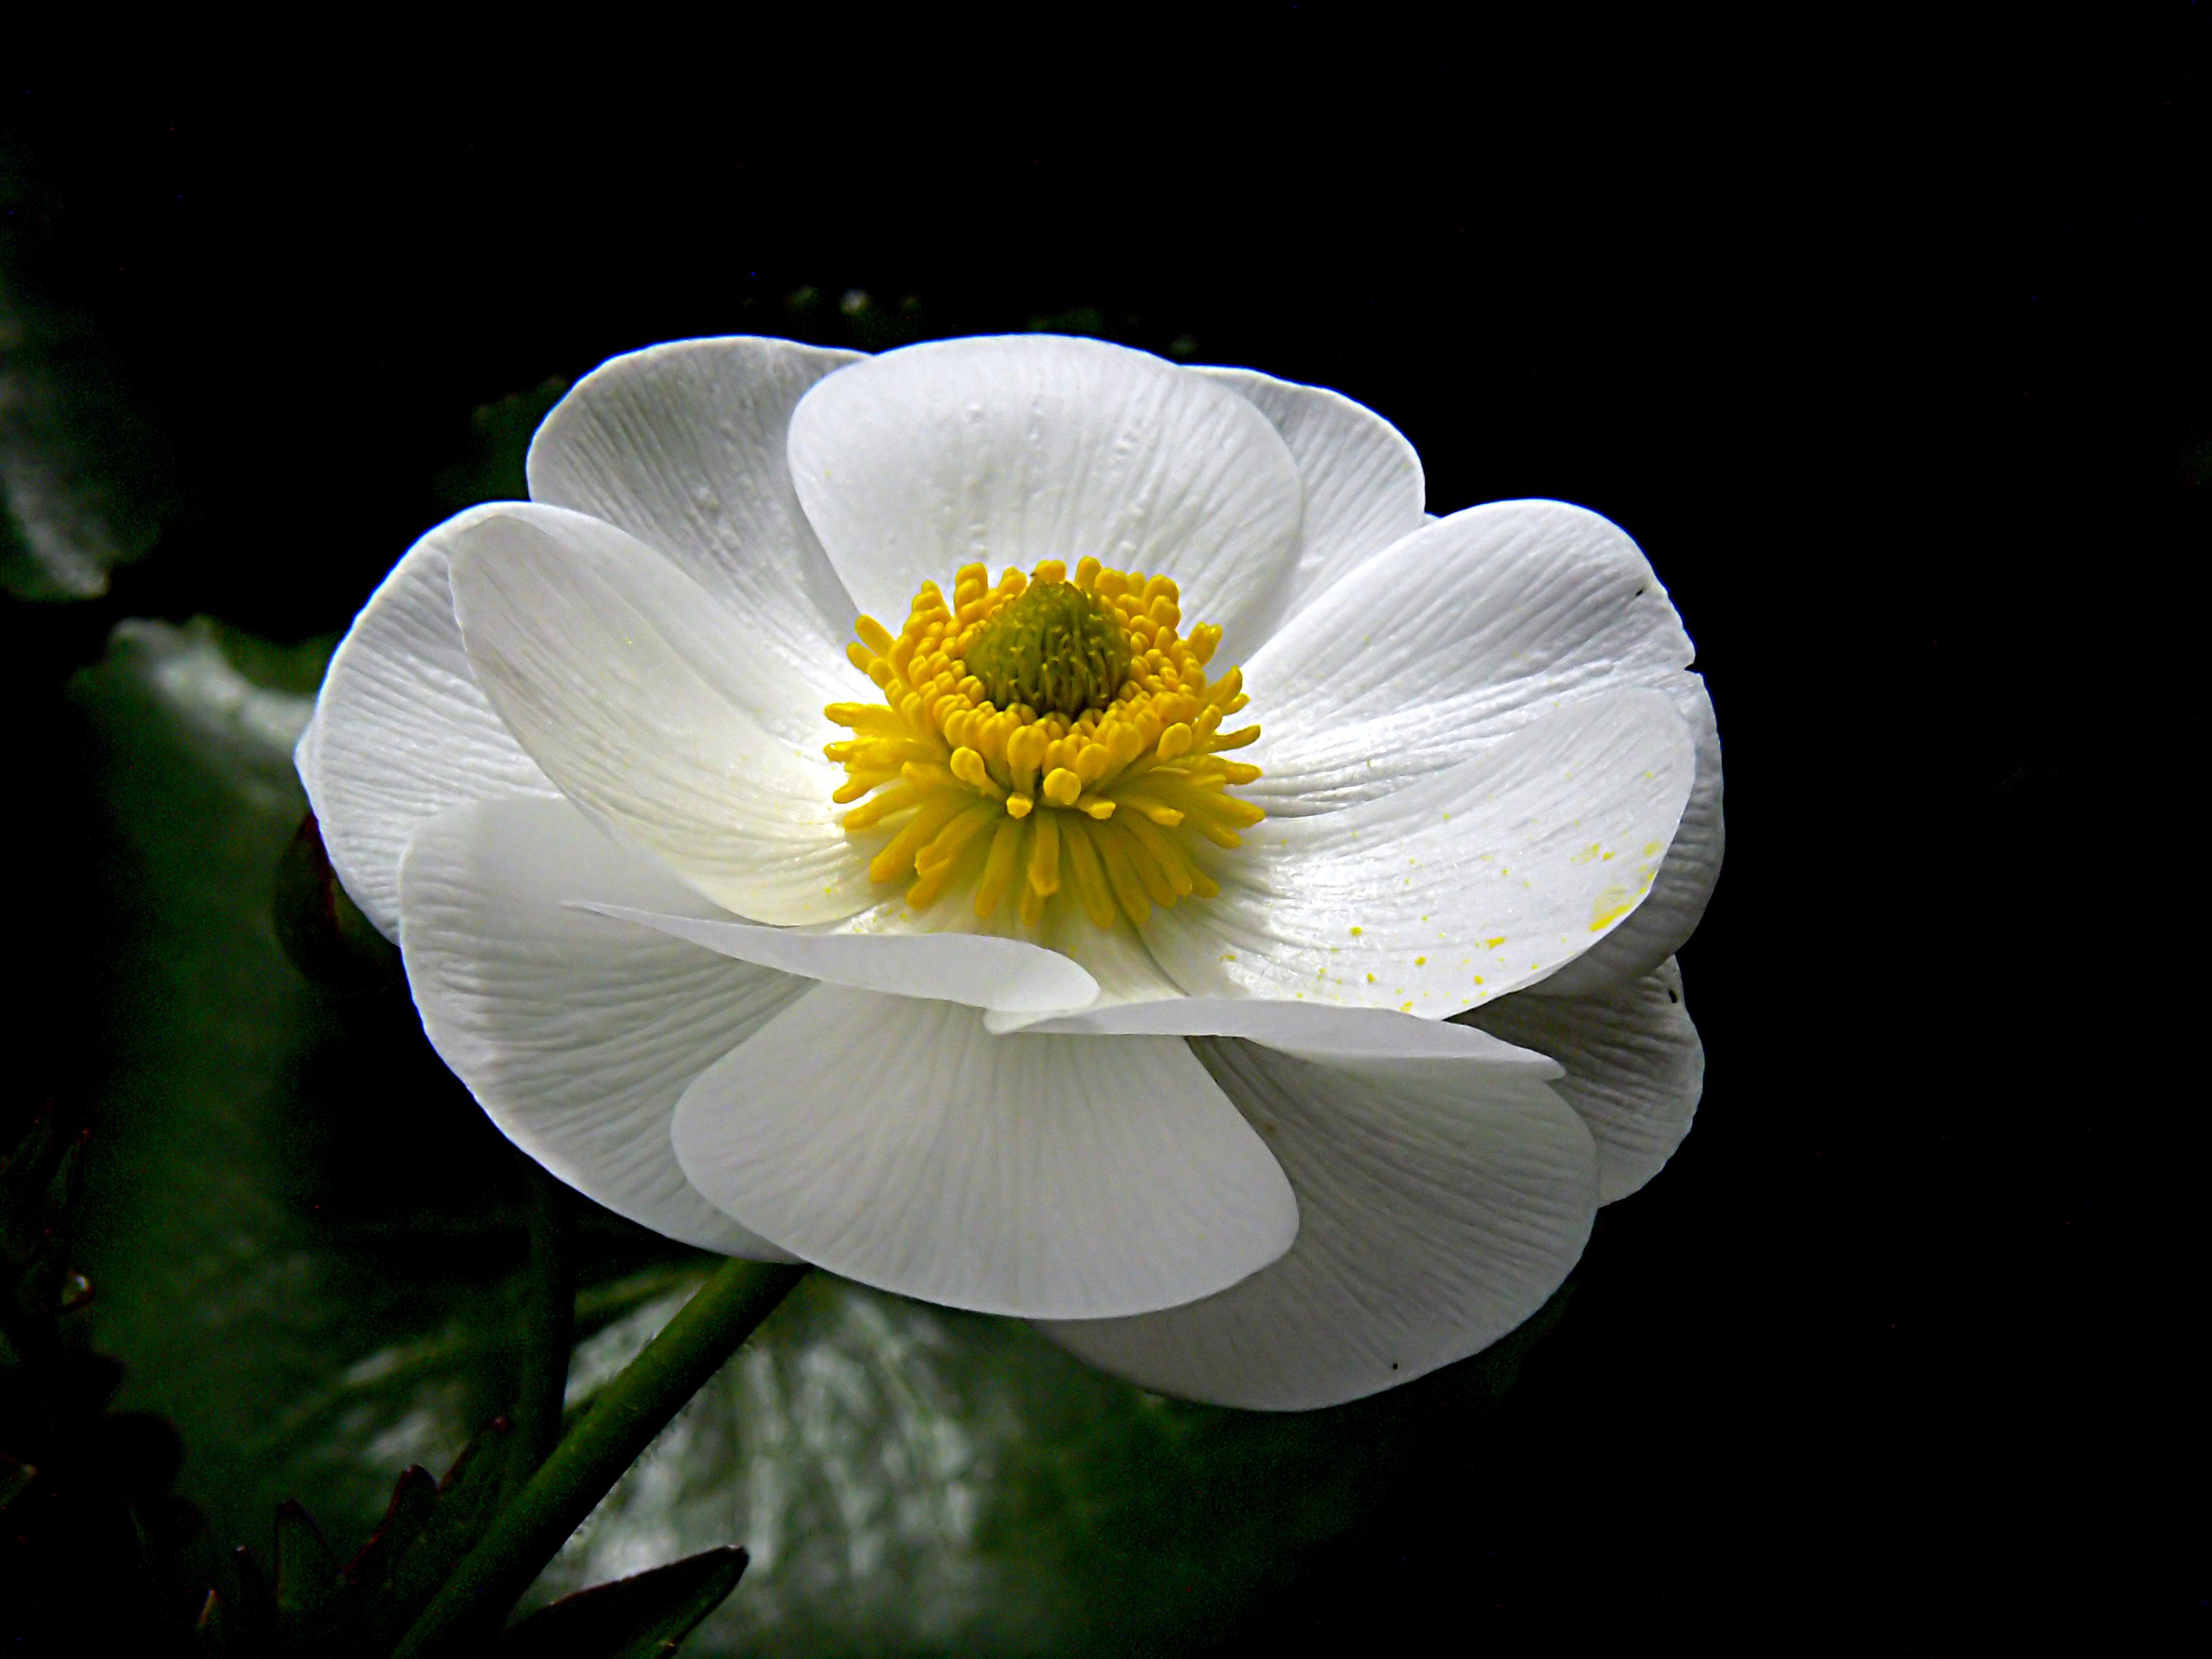 Mount cook lily. (ranunculus lyallii ) photo